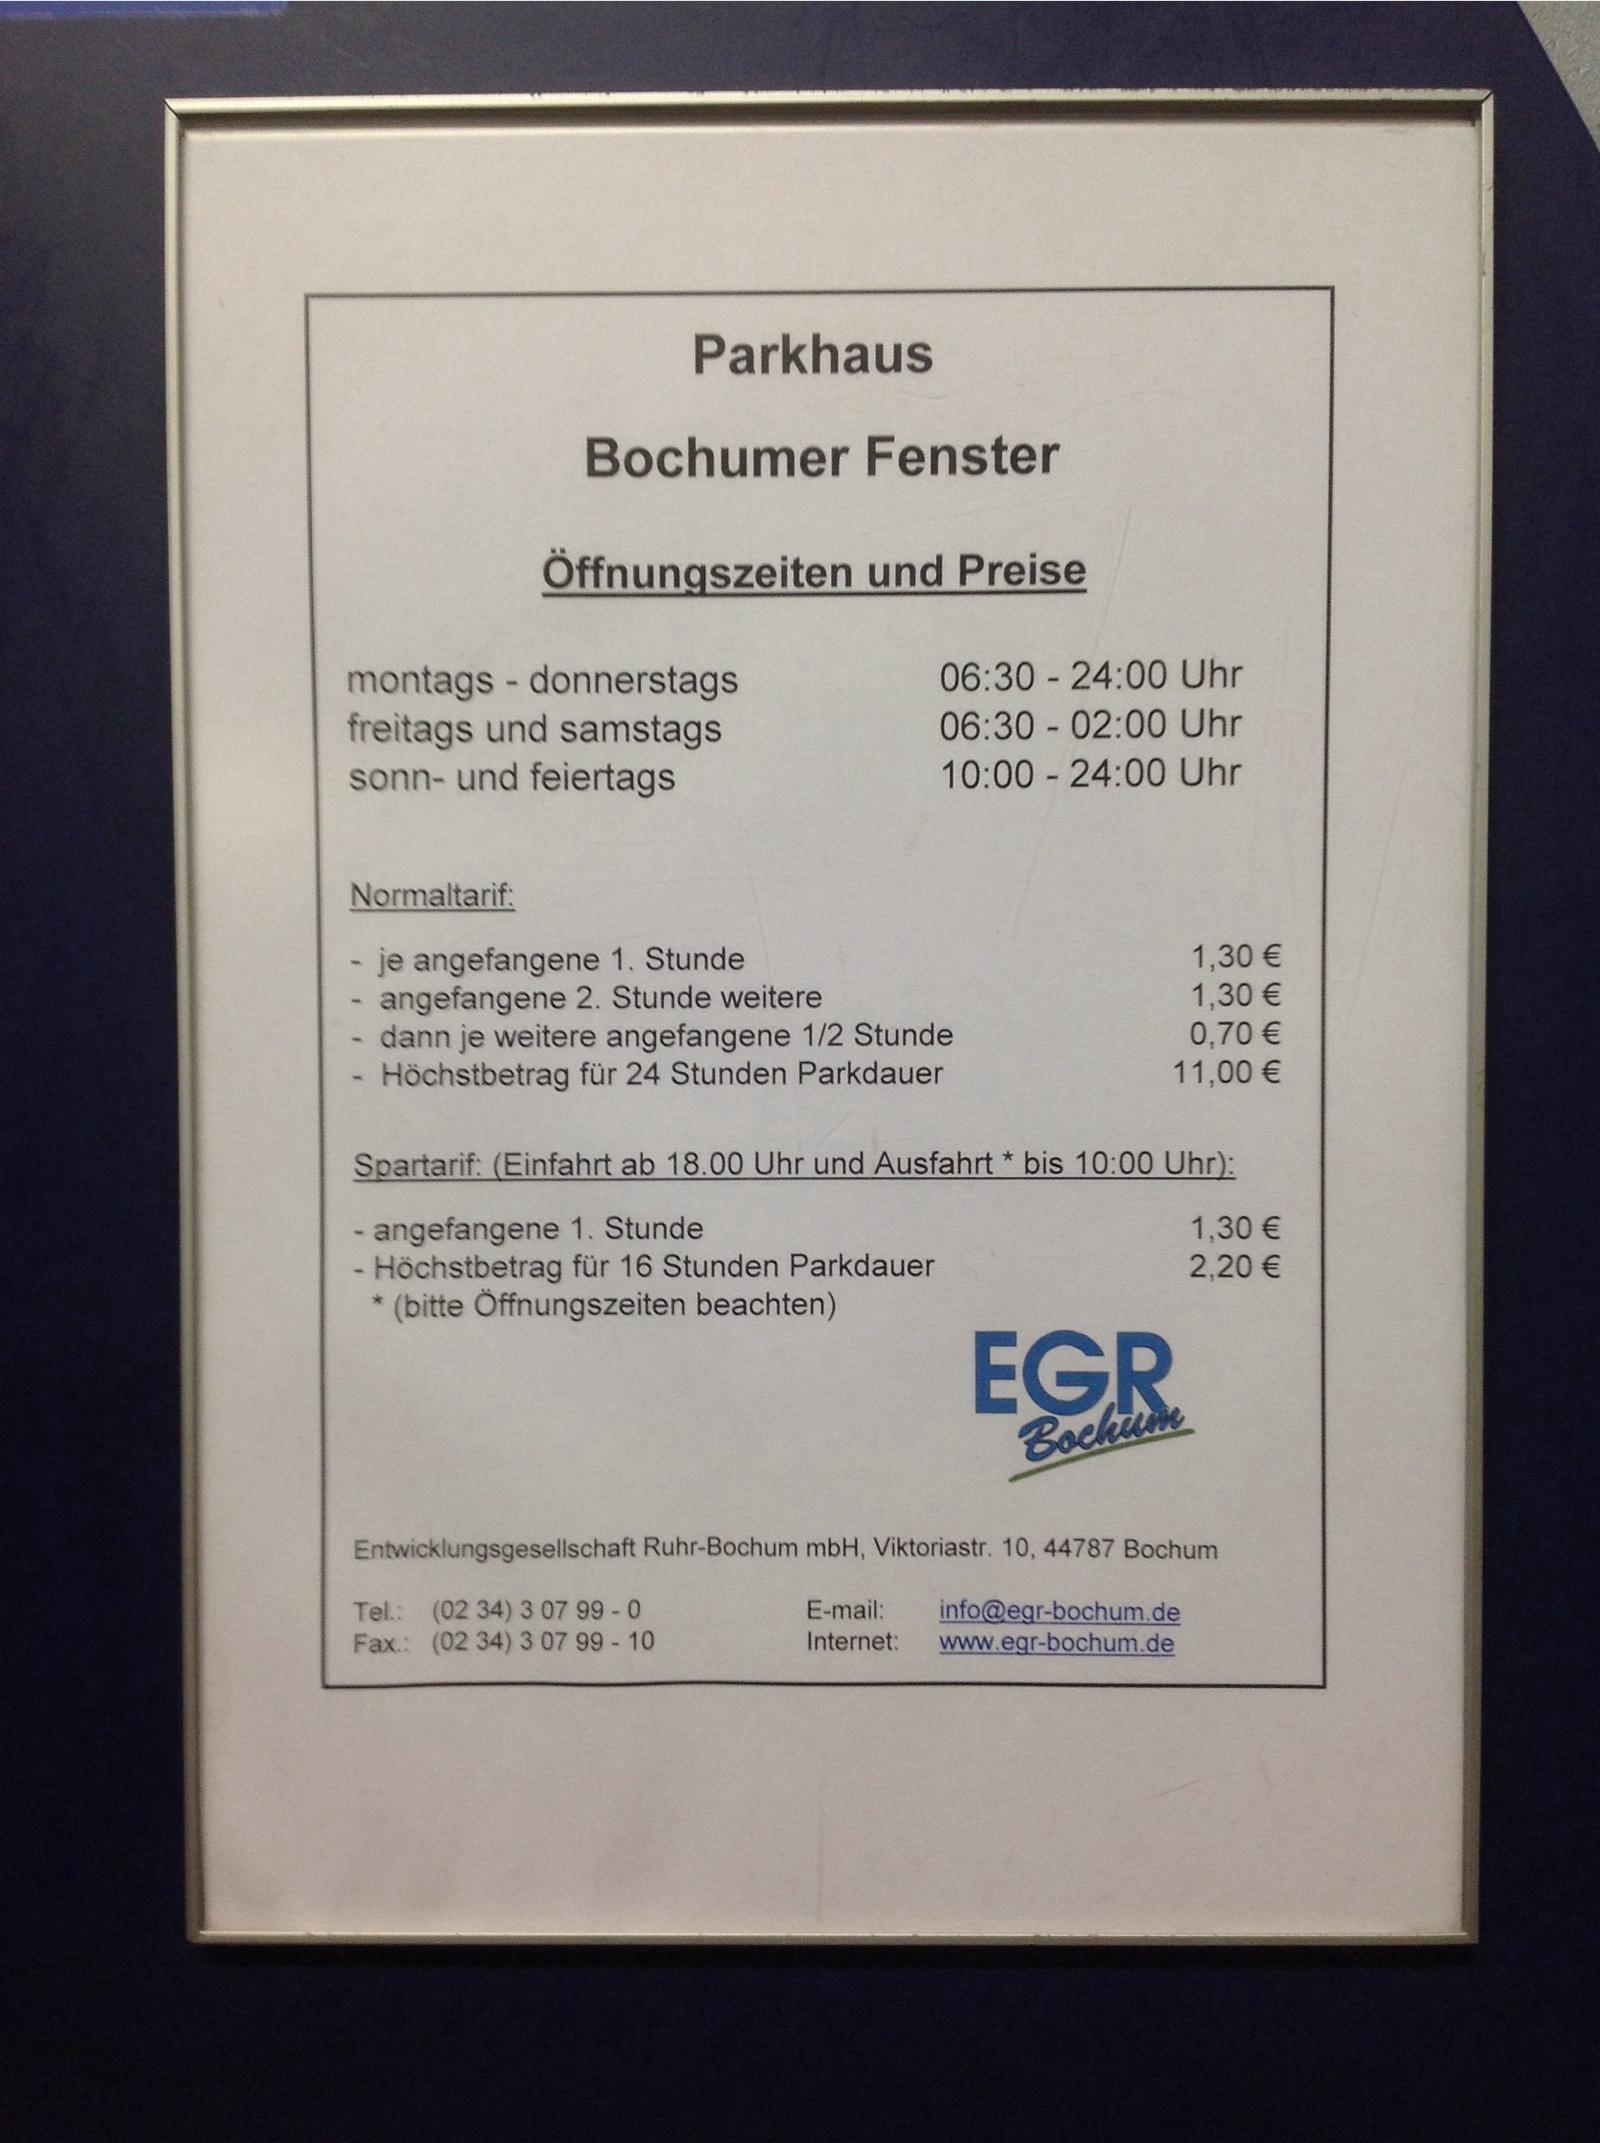 Fenster Bochum bochumer fenster parking in bochum parkme